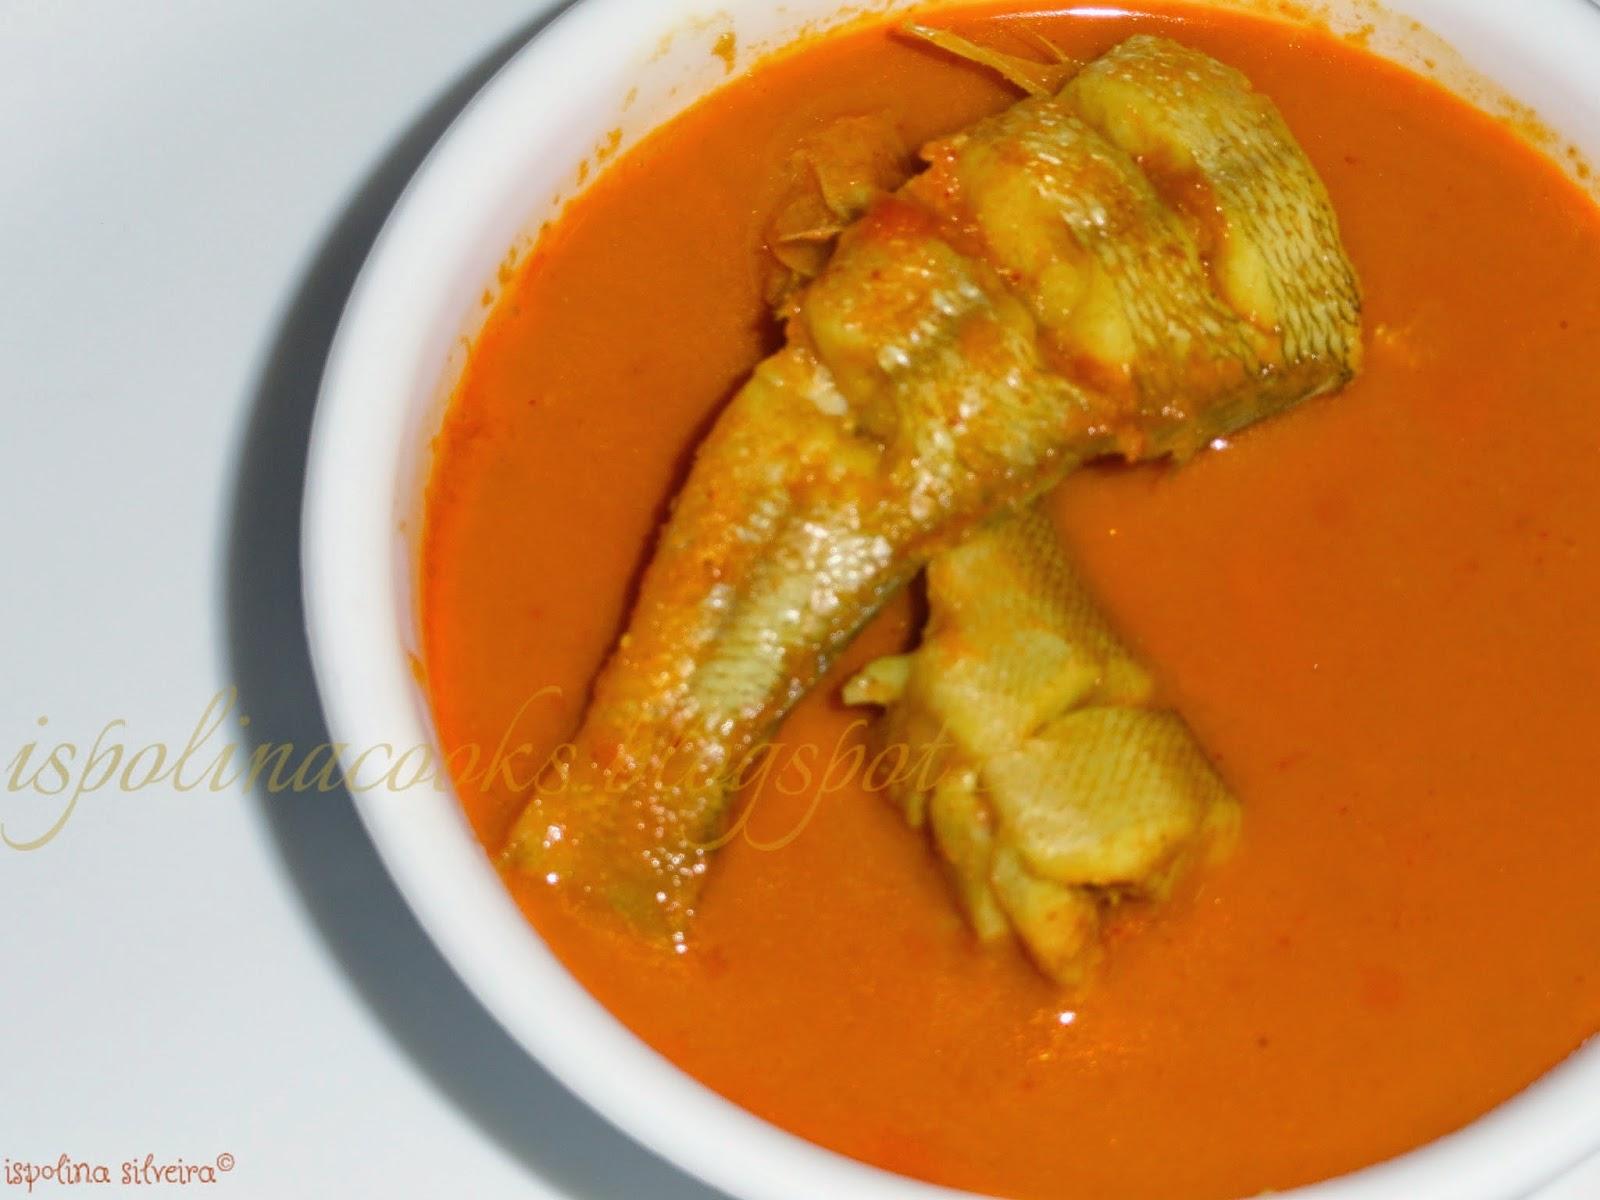 Cocina & Ispolina: Goan Style Fish curry & Fish fry !!!